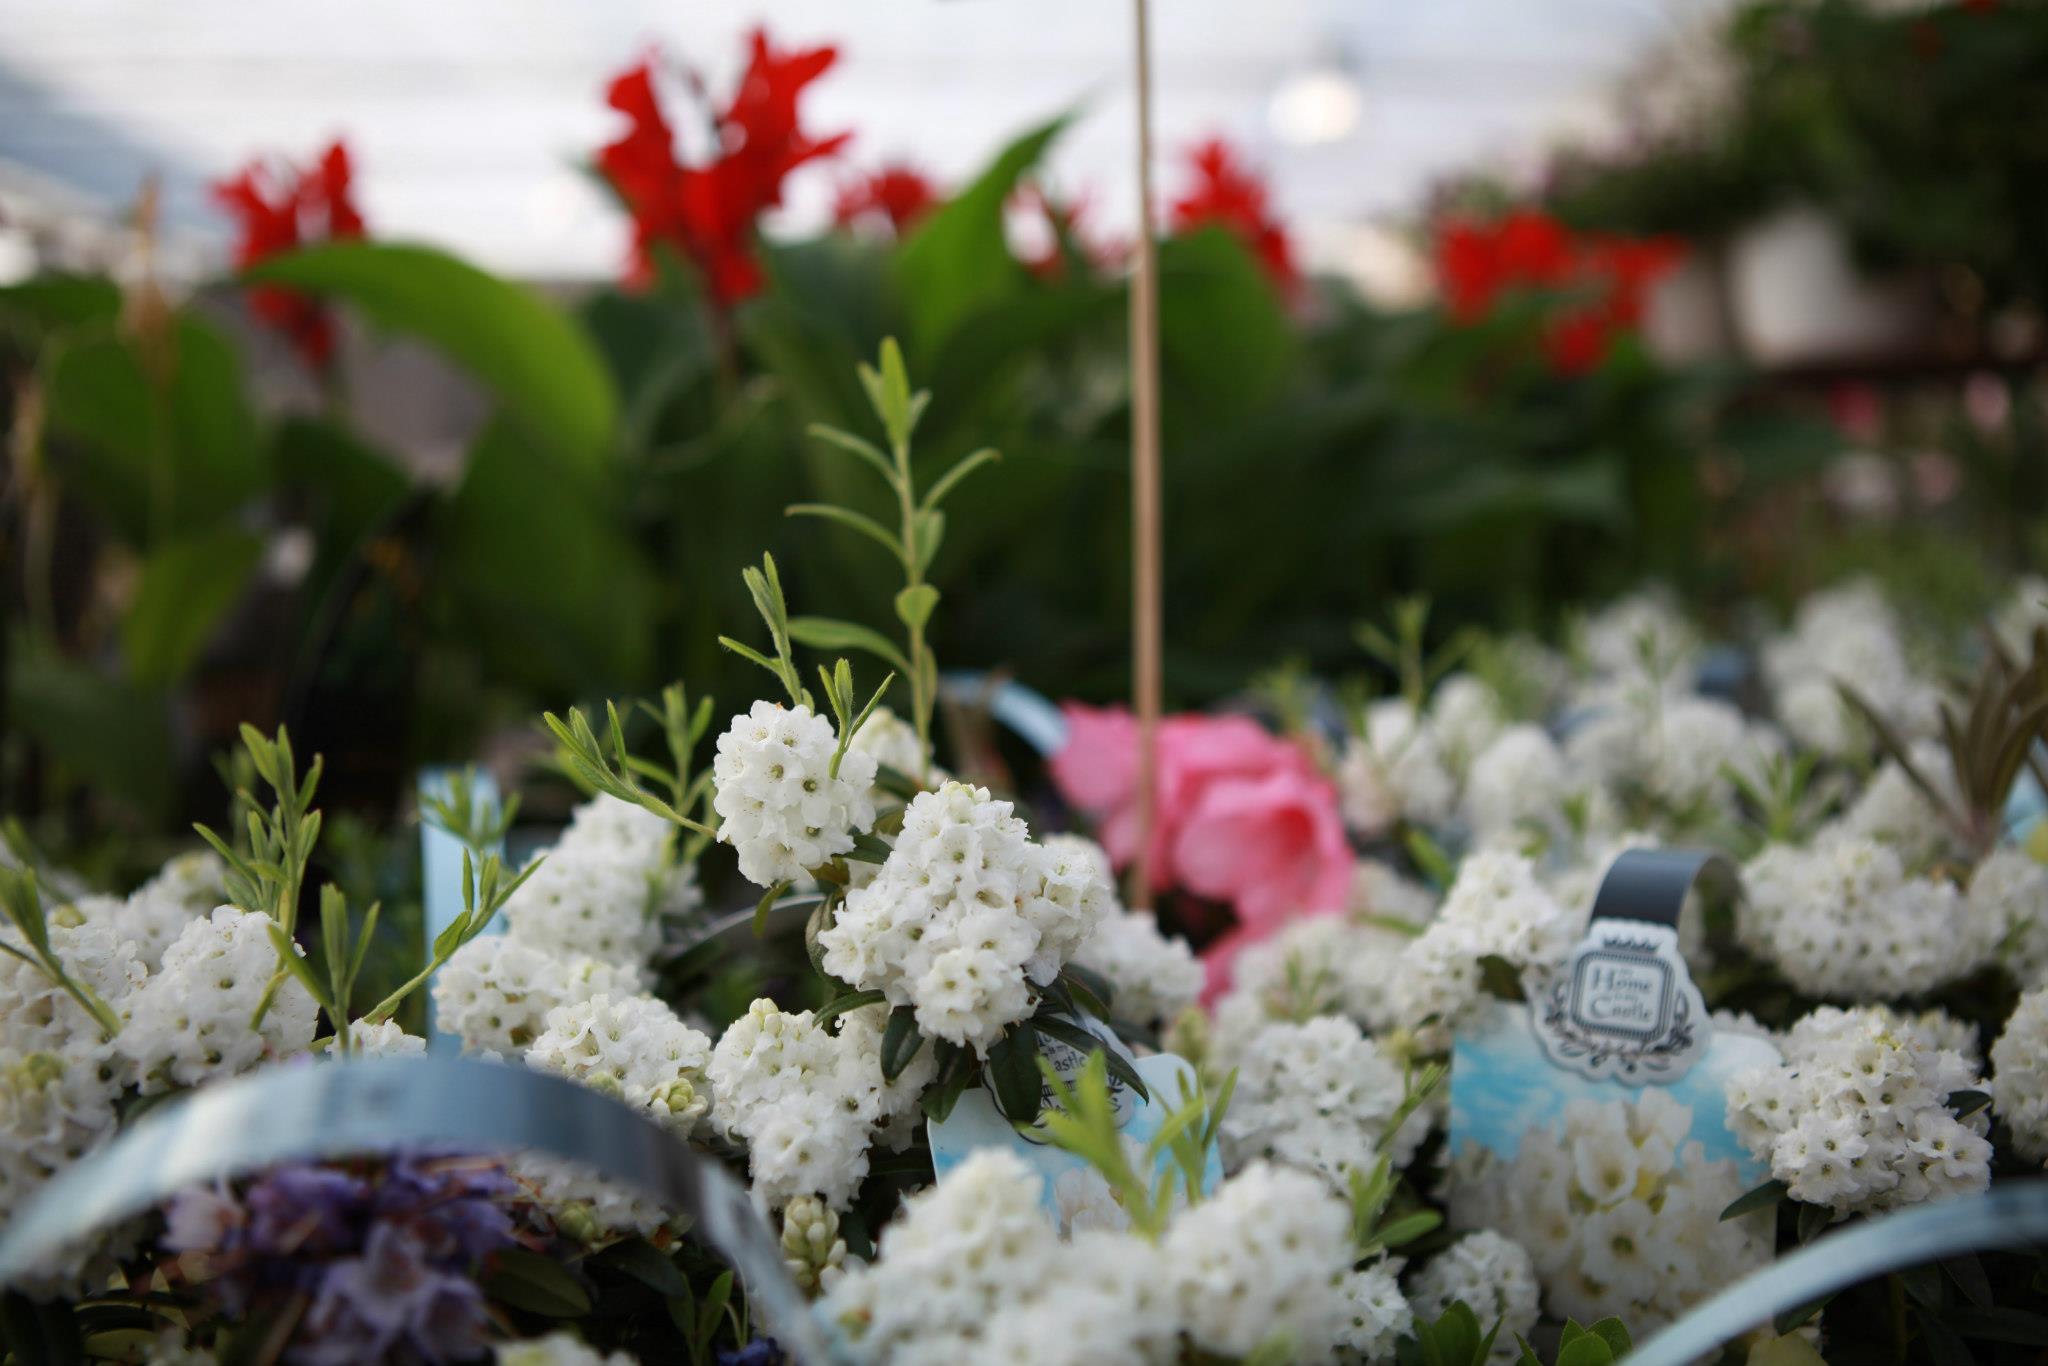 Valge suvelill jardin lilled for Jardin valge tijuana